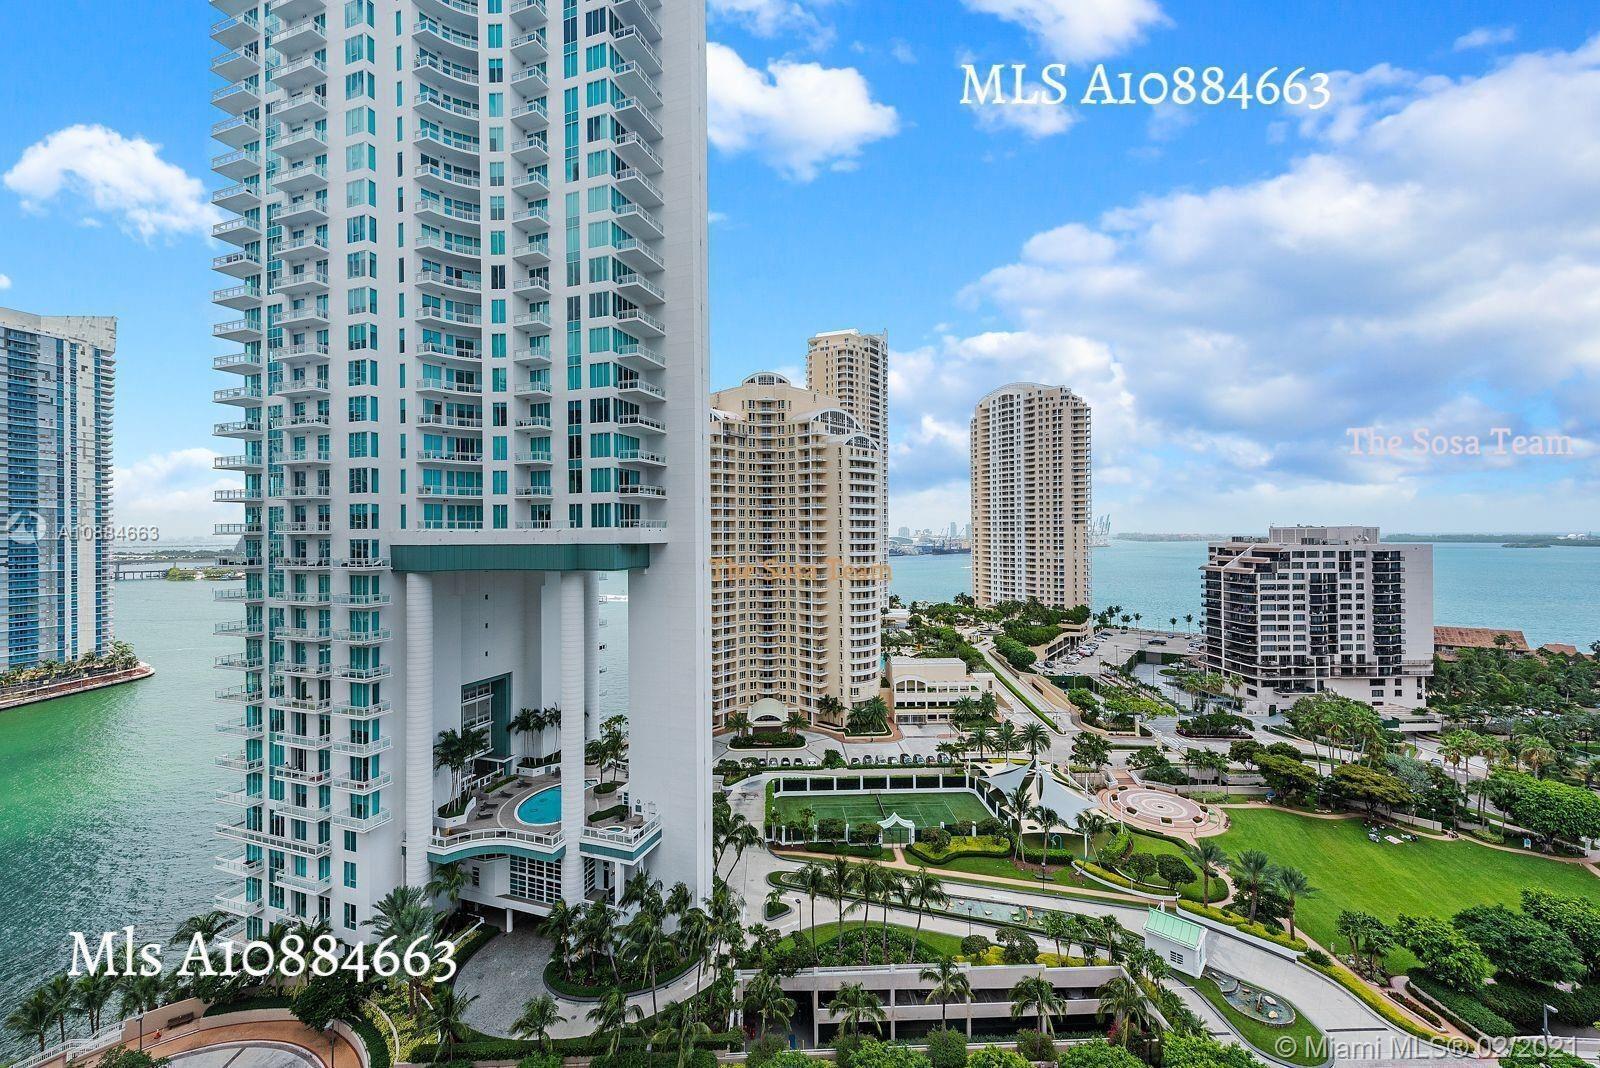 801 Brickell Key Blvd #1912, Miami, FL 33131 - #: A10884663